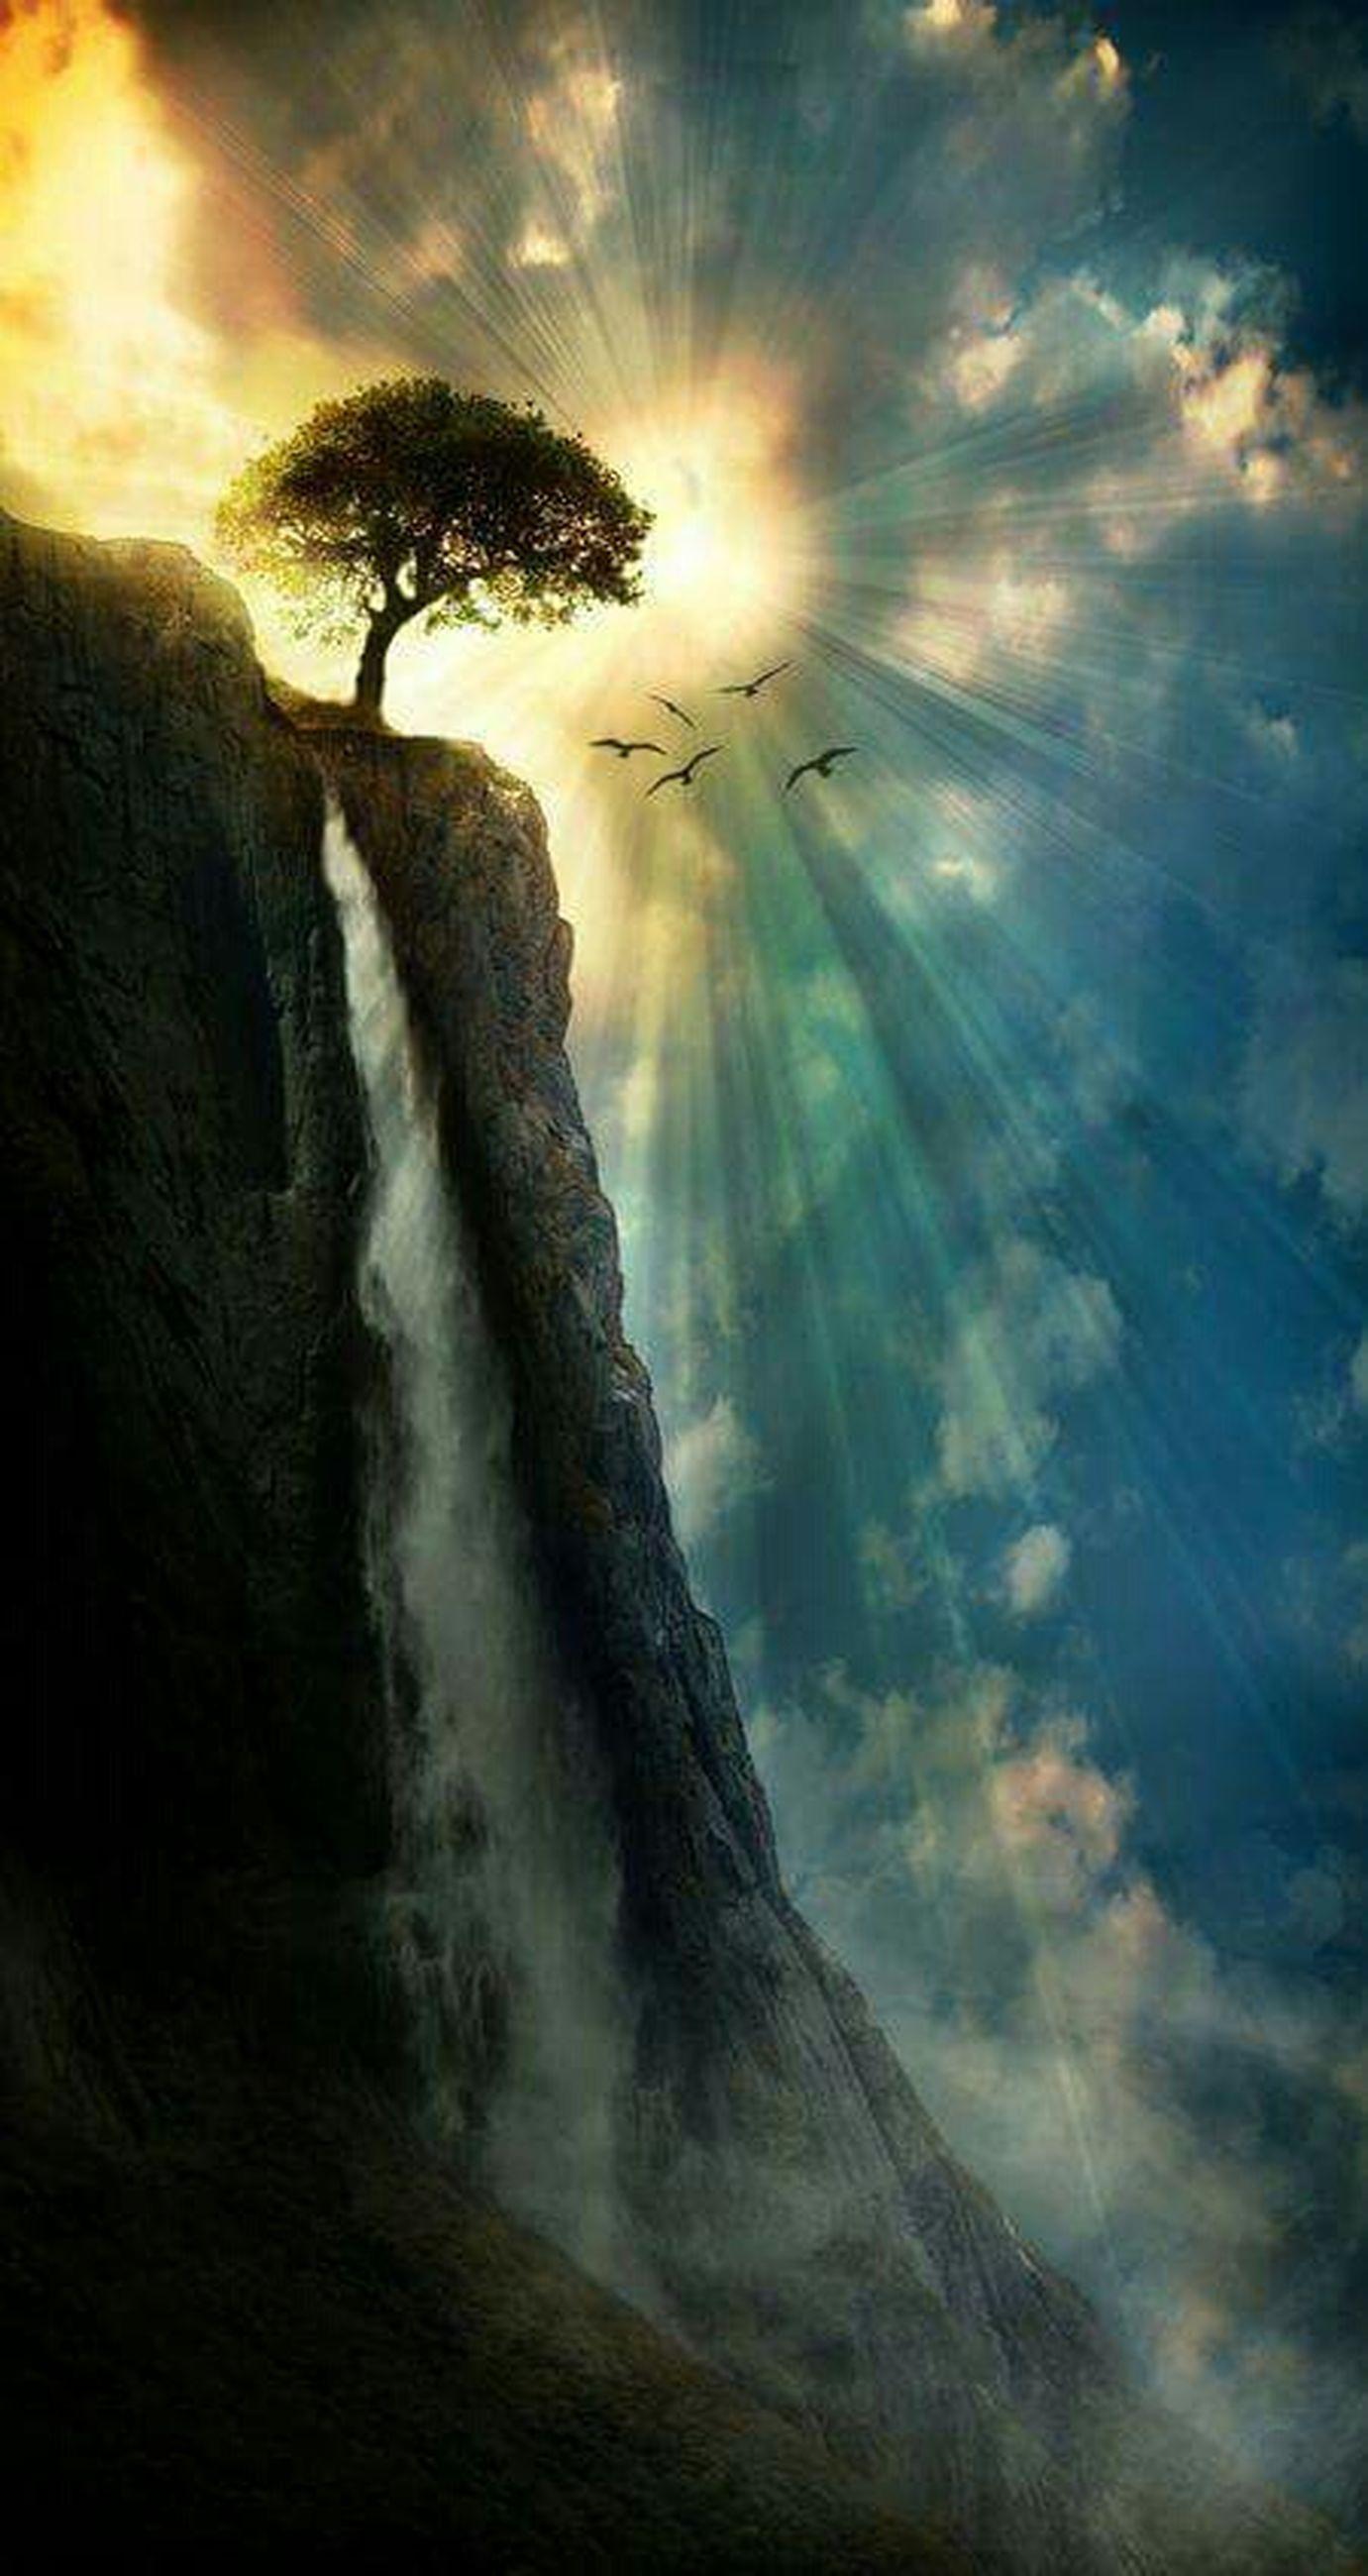 sky, water, tranquil scene, beauty in nature, tranquility, scenics, silhouette, sun, nature, cloud - sky, sunlight, sunbeam, sunset, sea, tree, idyllic, rock - object, non-urban scene, outdoors, cloud